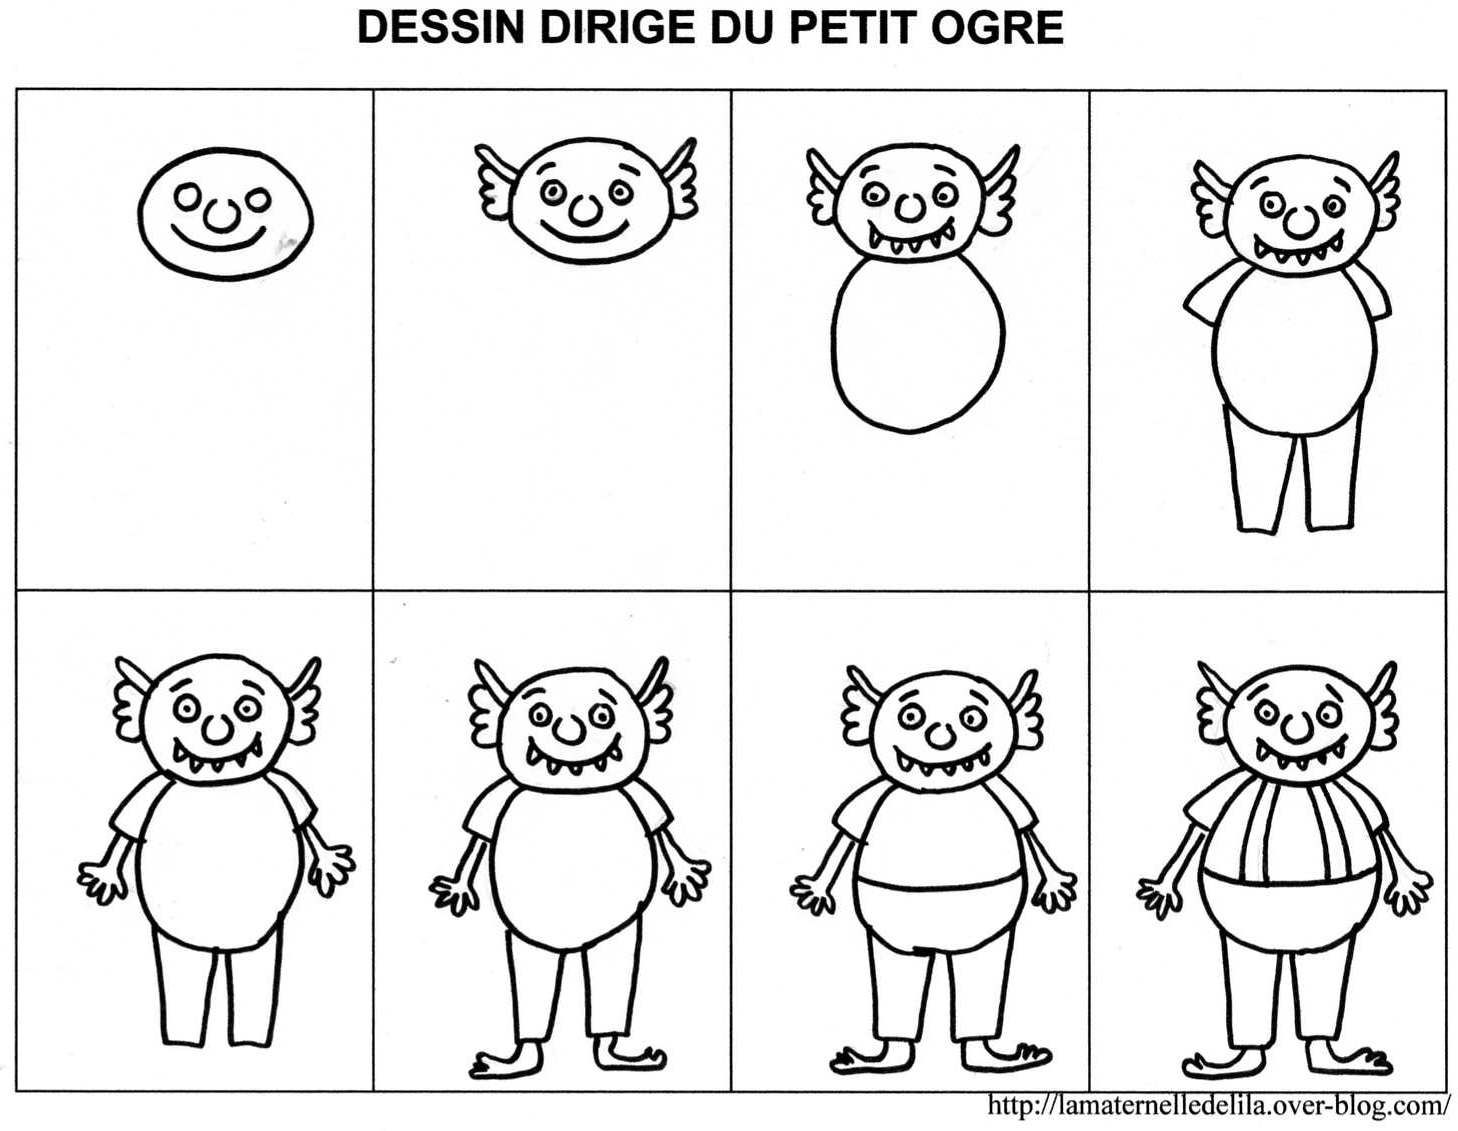 Dessin Dirigé Du Petit Ogre Petit Ogre Ogre Et Ogre